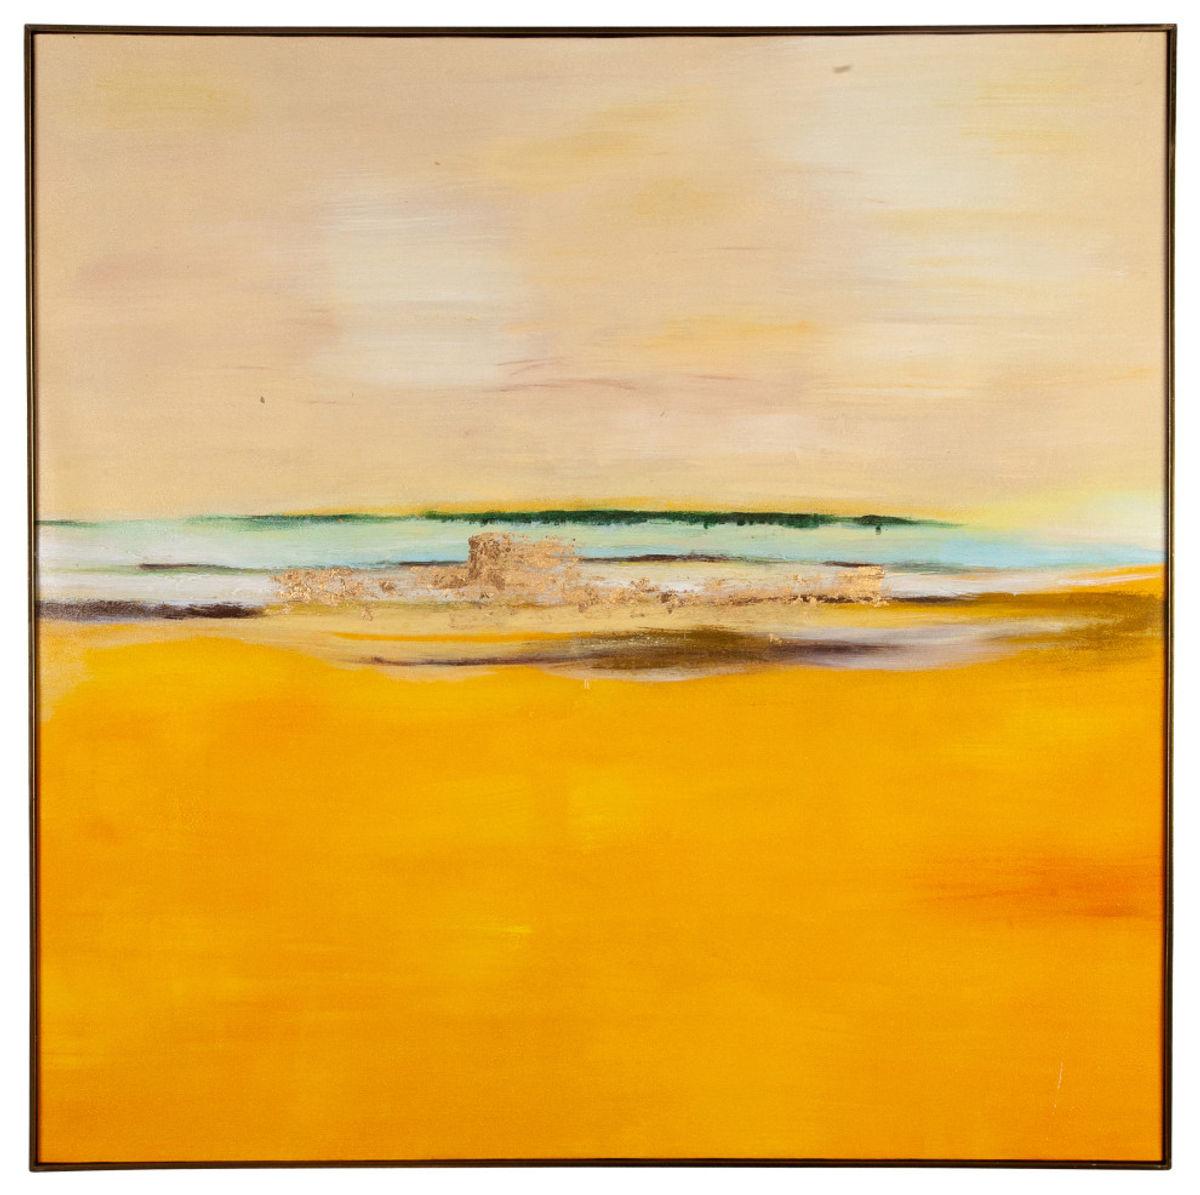 Framed Art, Abstract #32